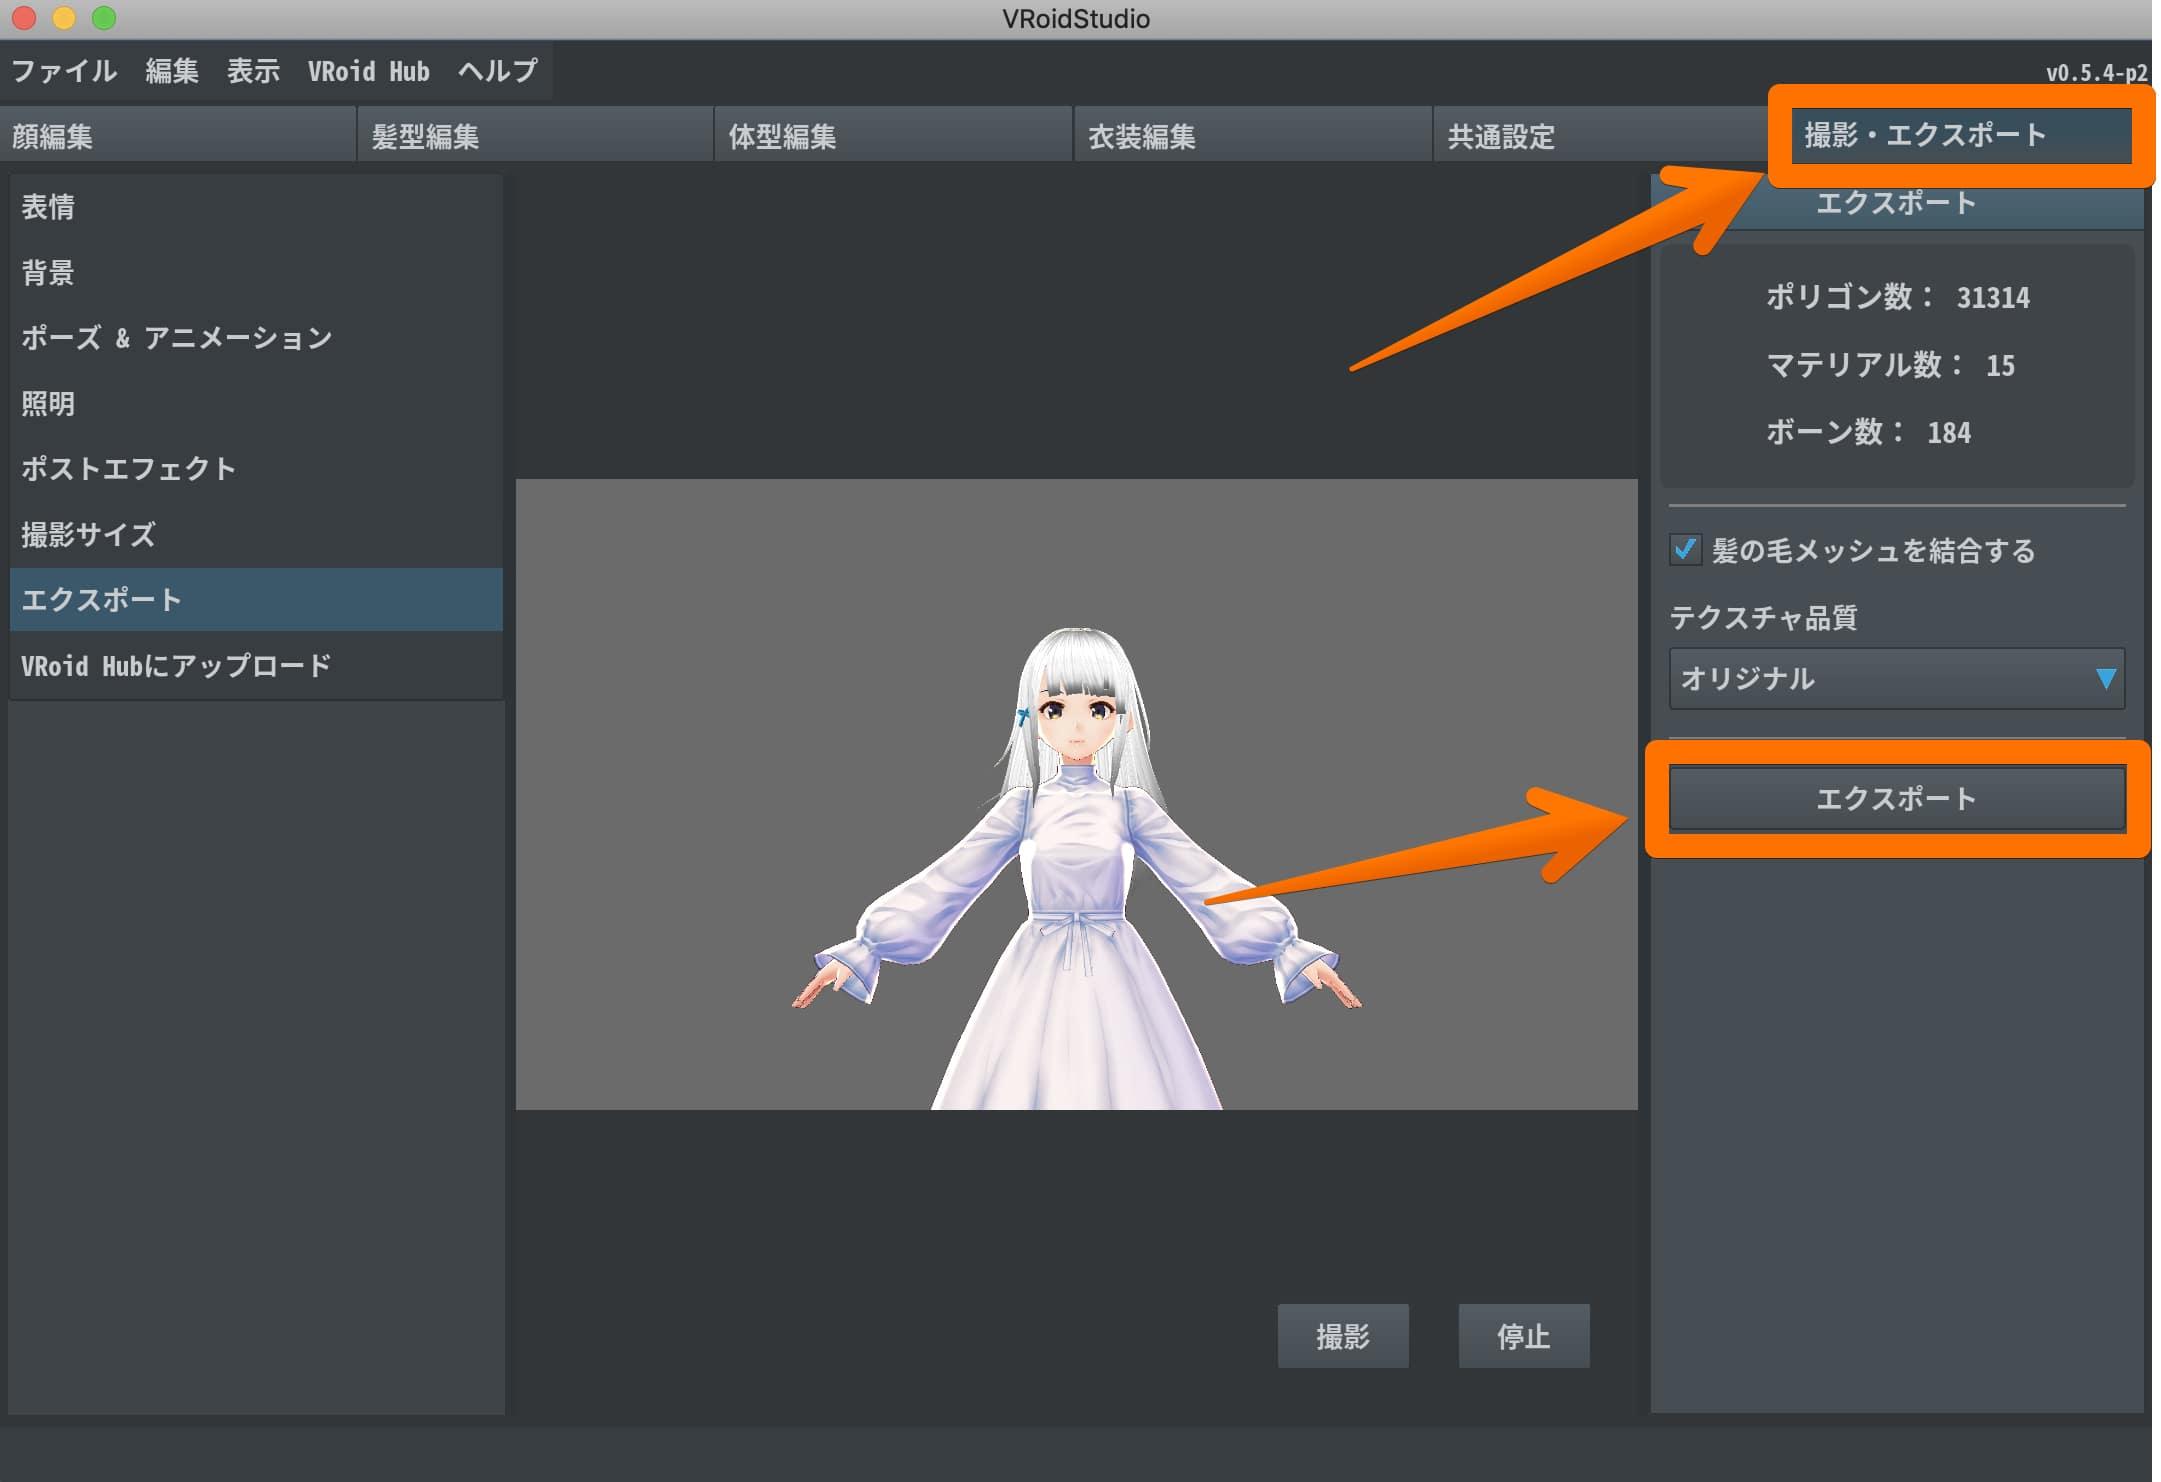 VRoidStudioでアバターをエクスポートする